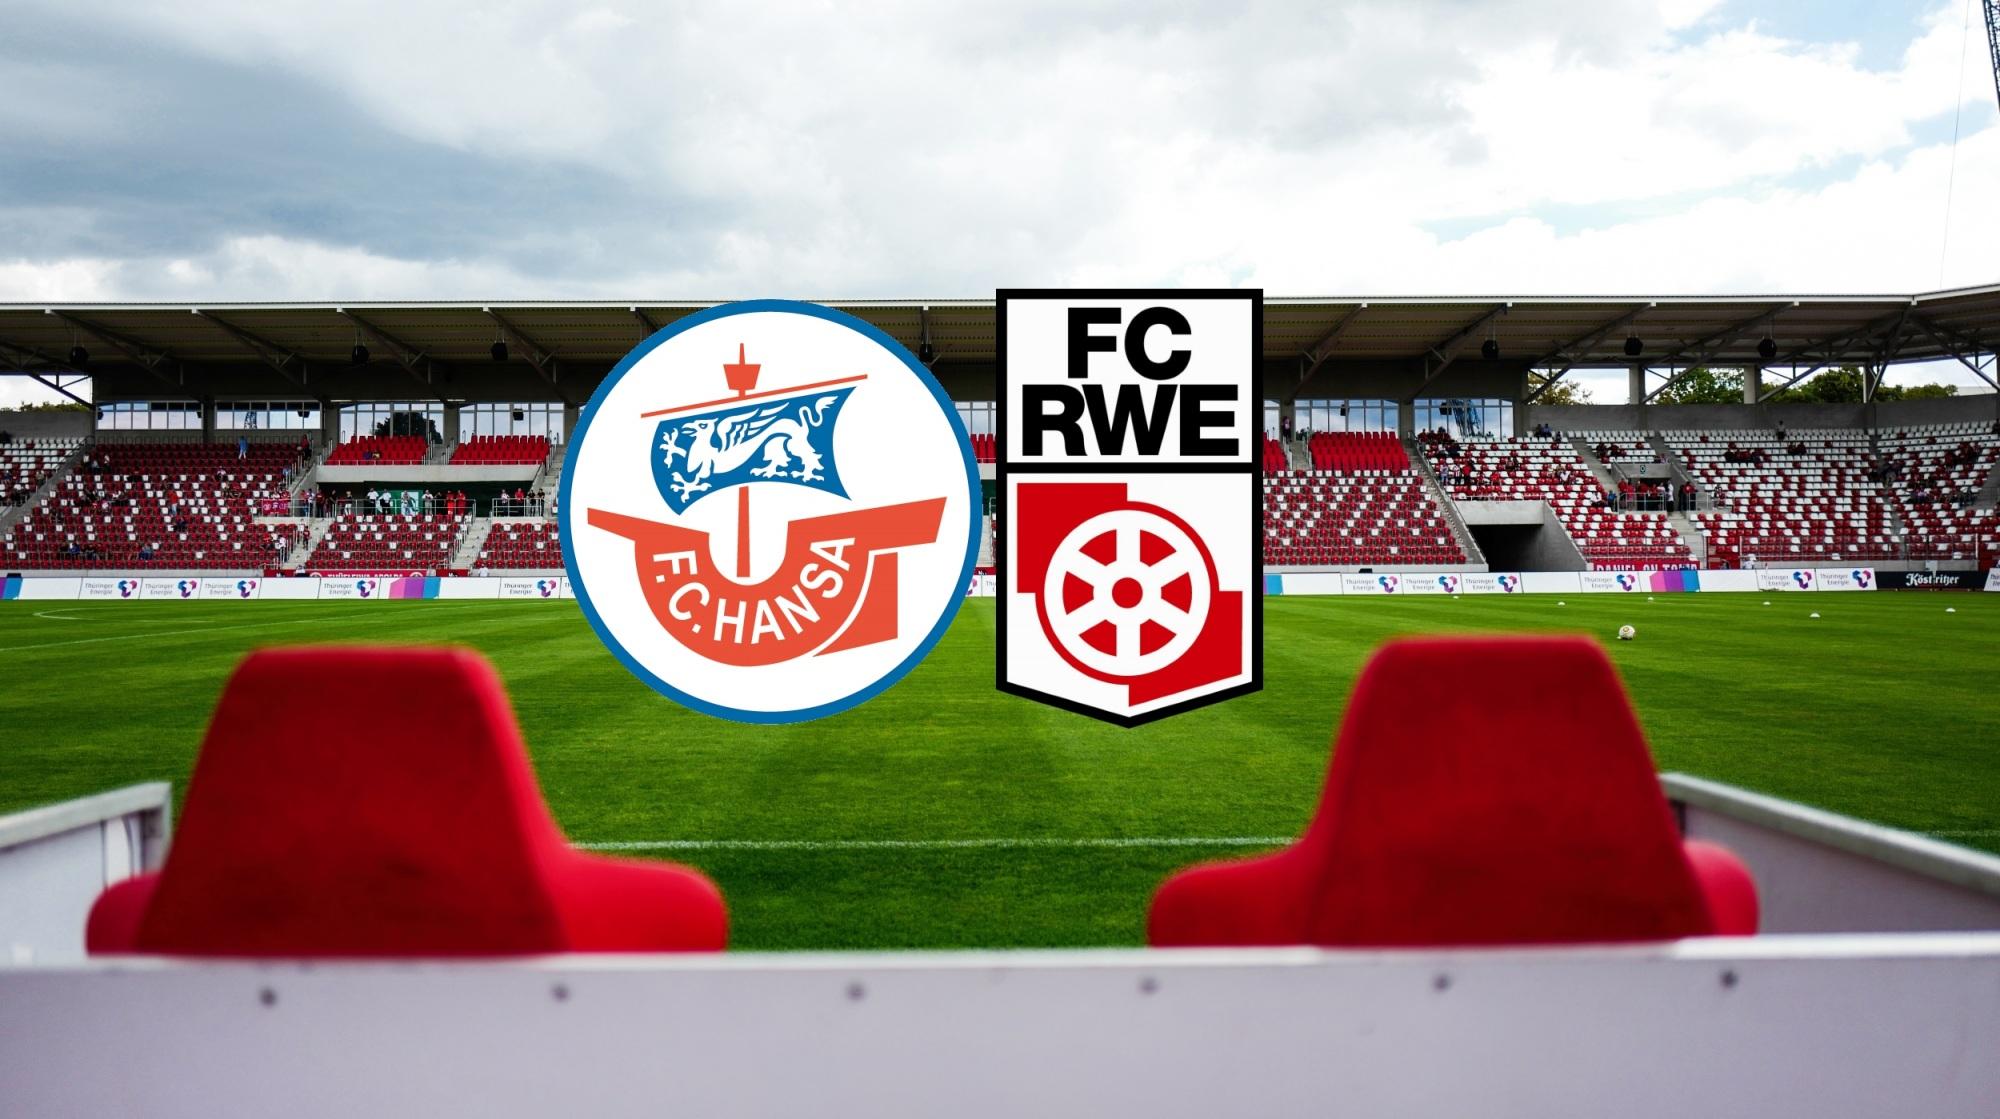 Rwe Erfurt Live Ticker